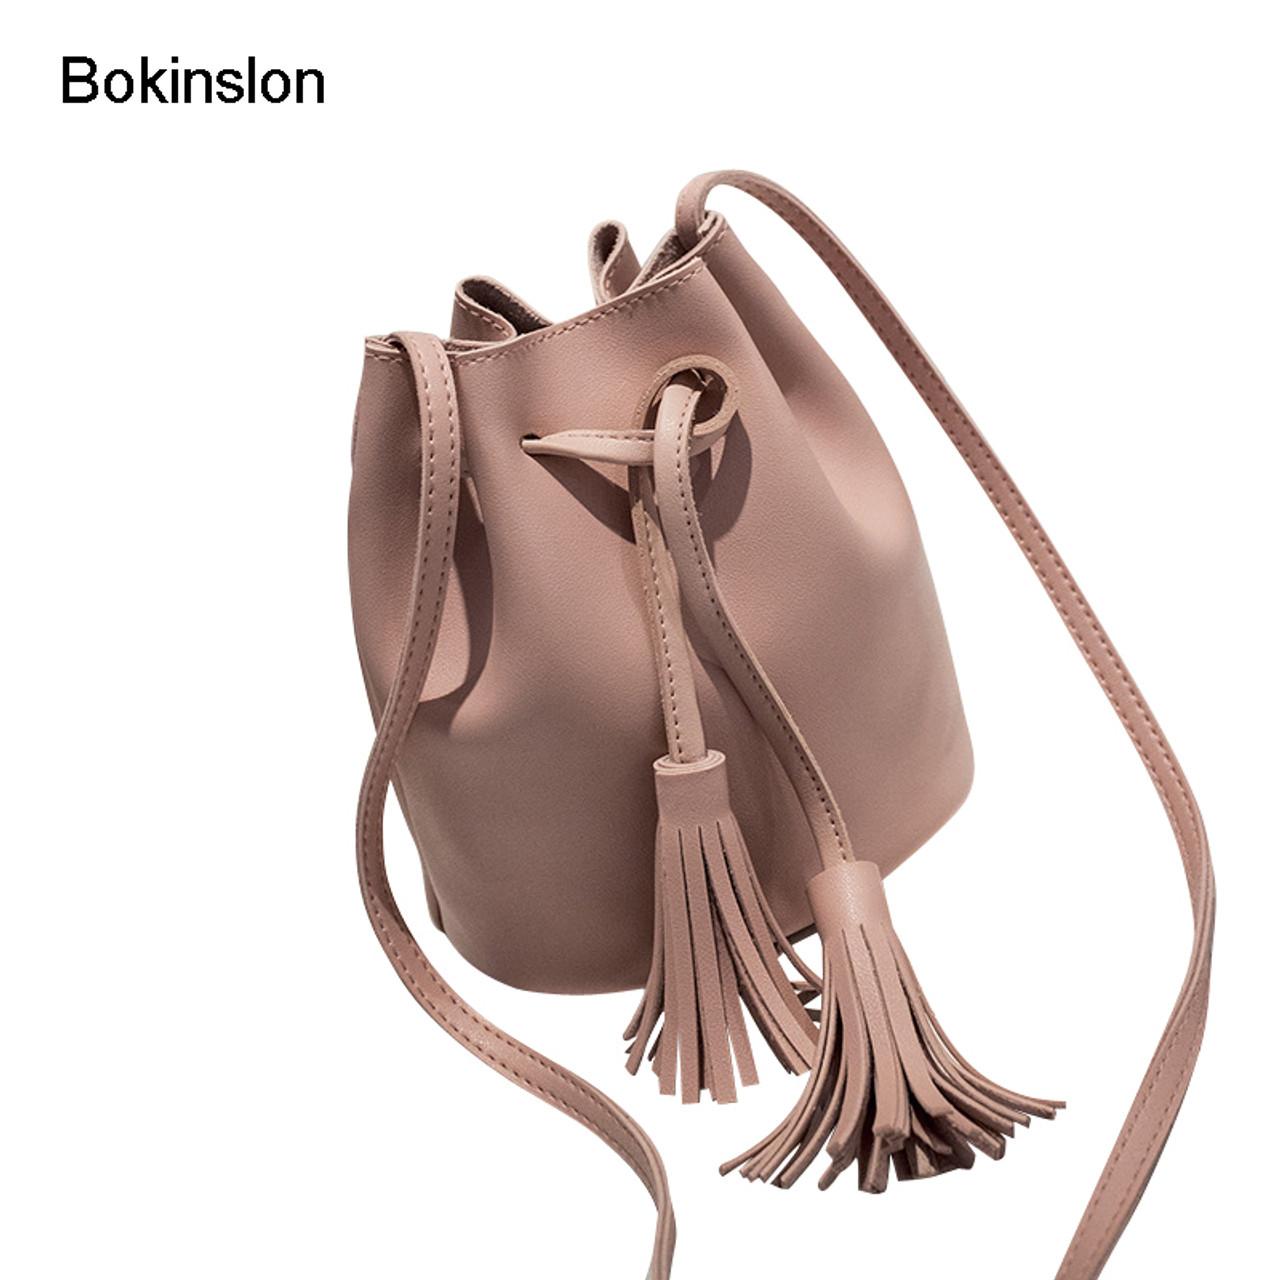 Bokinslon Tassel Shoulder Bags Girls PU Leather Retro Woman Crossbody Bags  Solid Color Fashion Drawstring Female ... e33a332f8690f